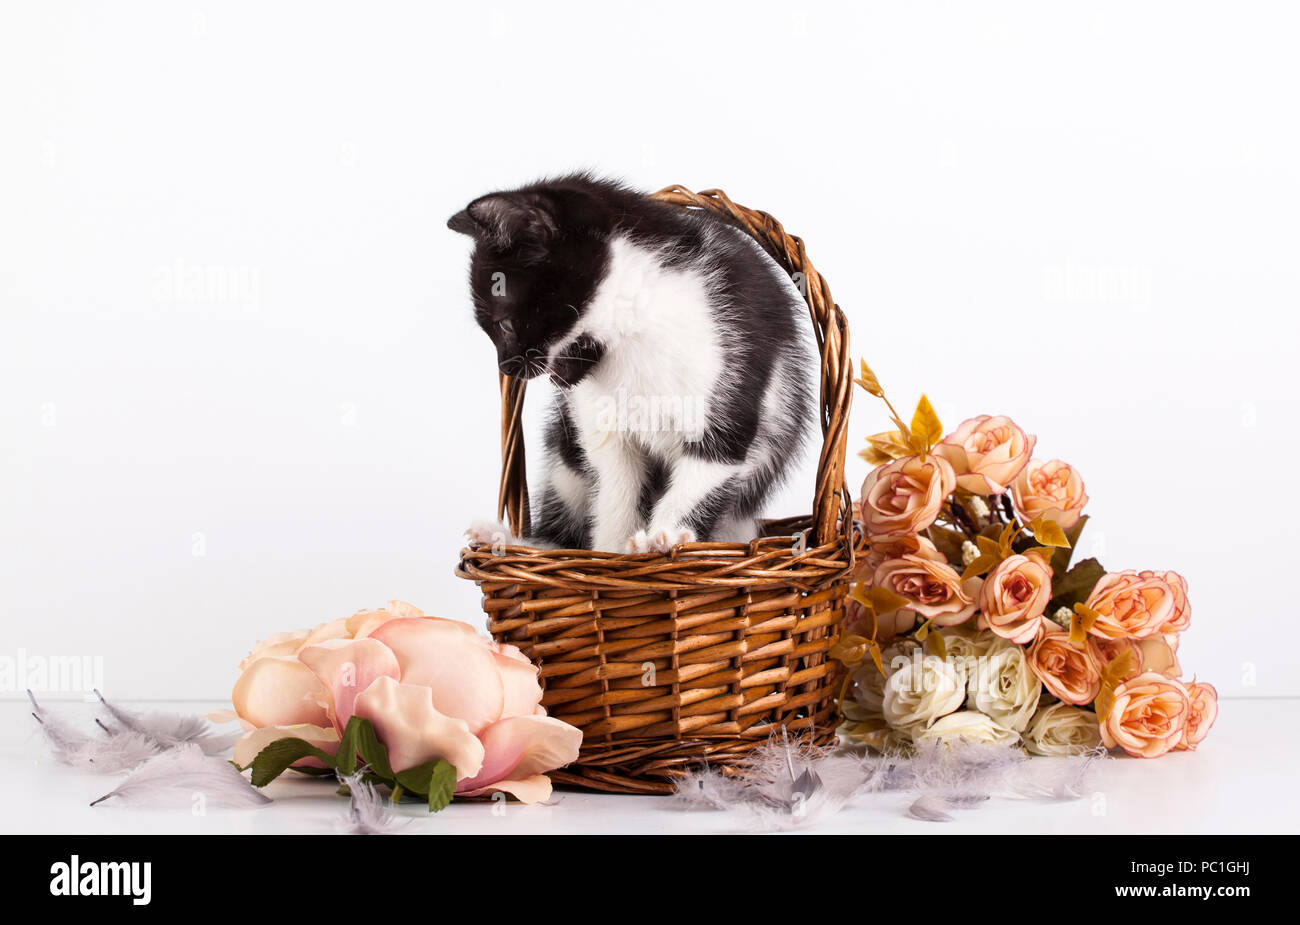 Image result for flores lindas en canastas